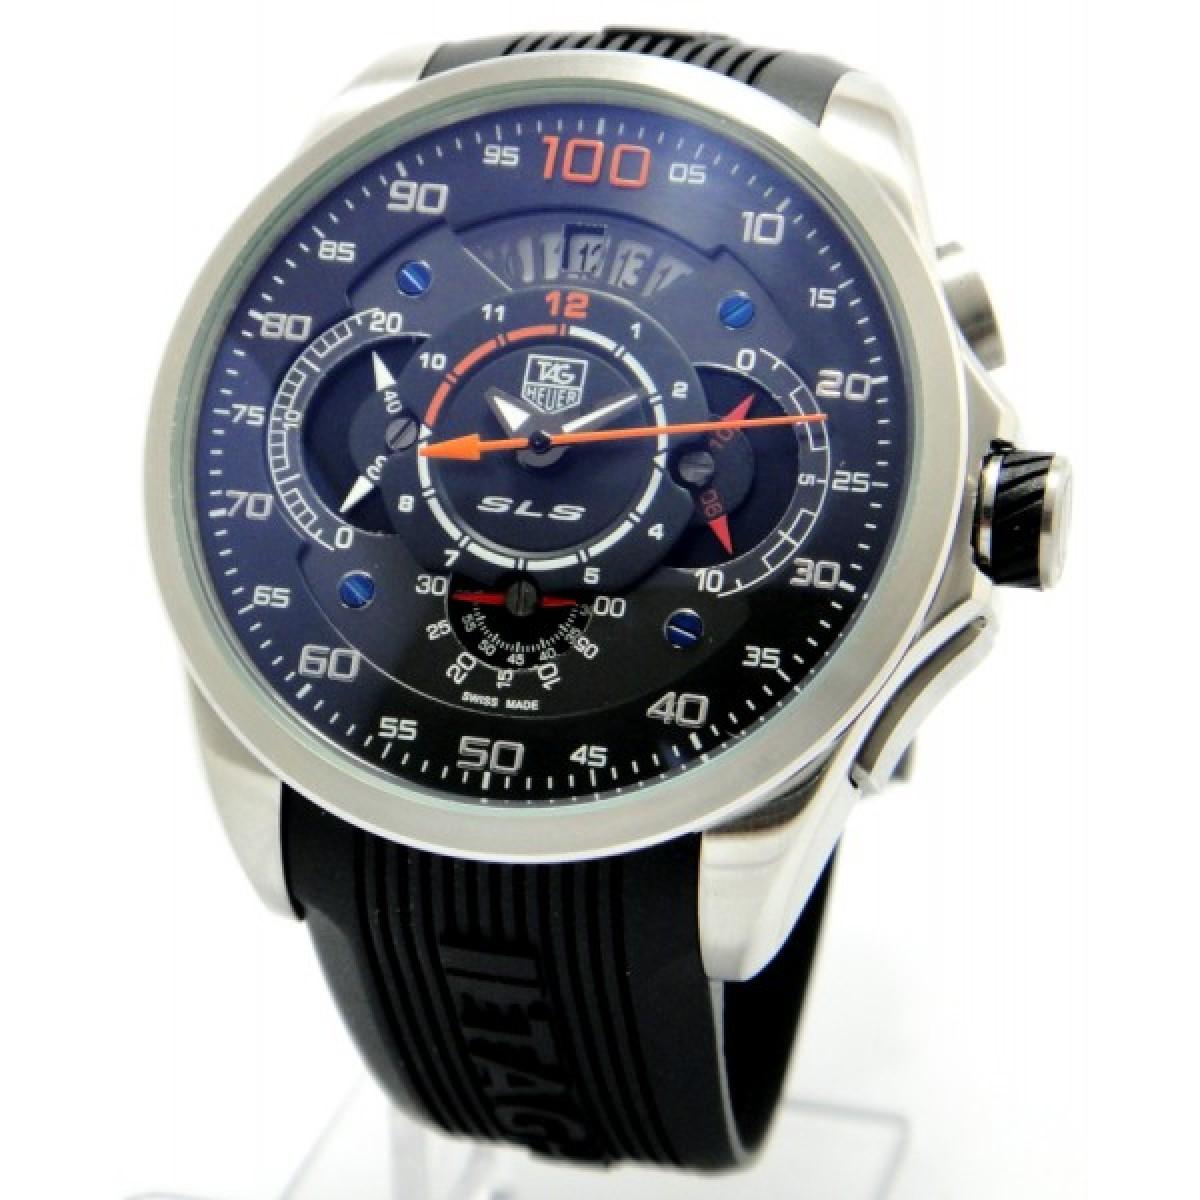 c867d4d7f9f Relógios Réplica Tag Heuer Carrera Mercedez Slr Laranja